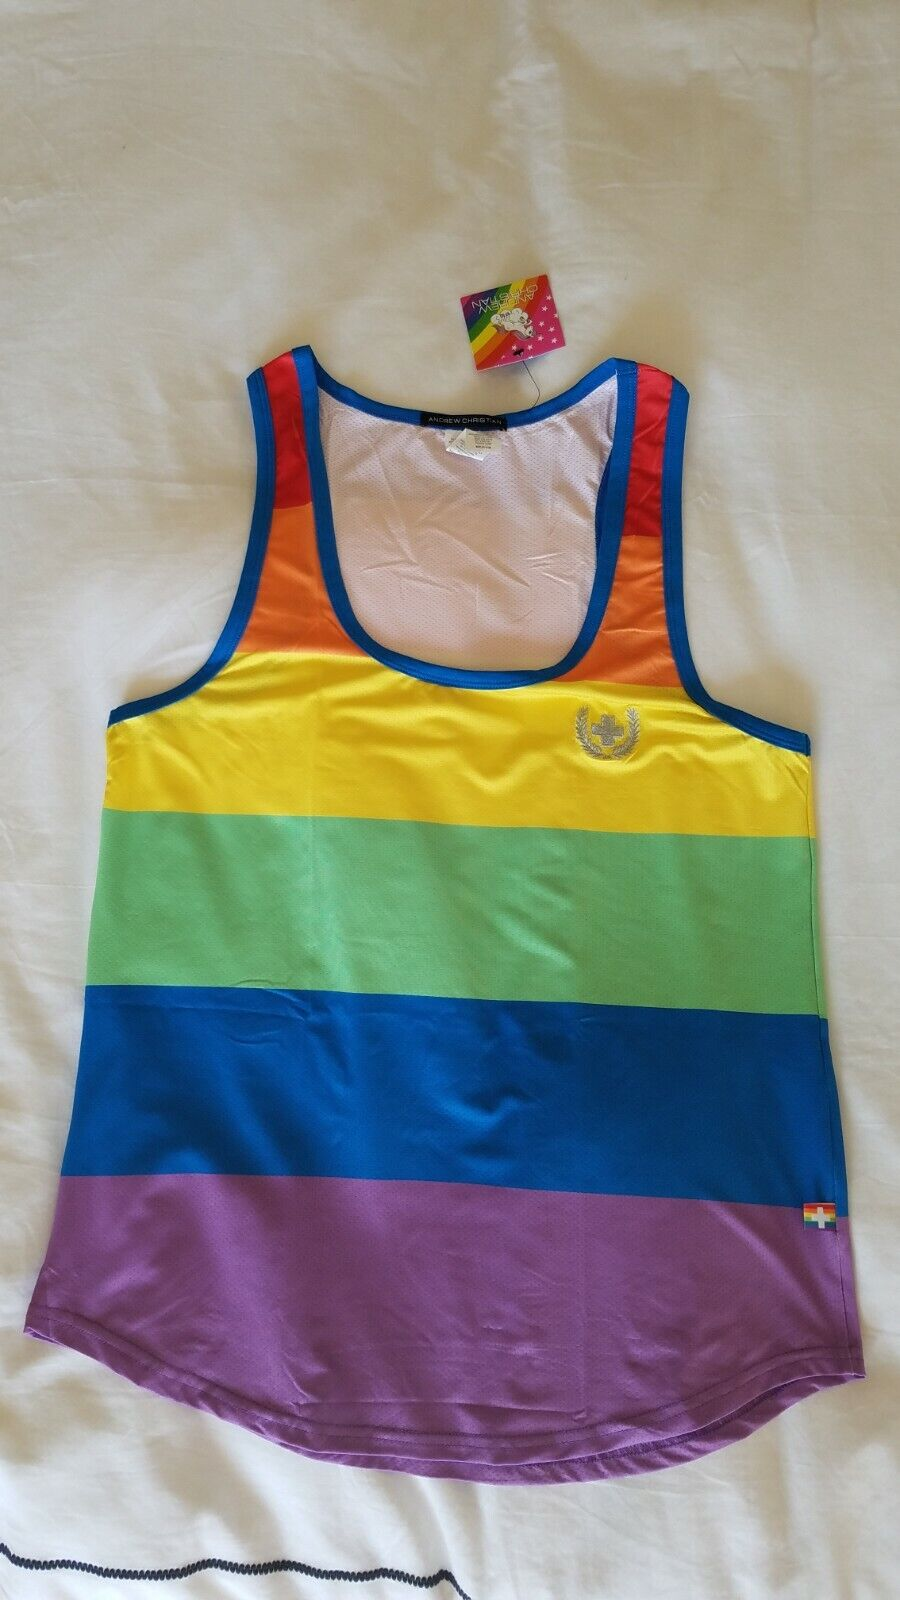 Andrew Christian Ultra Pride Tank Top Medium NWT & Bag LGBT Gay